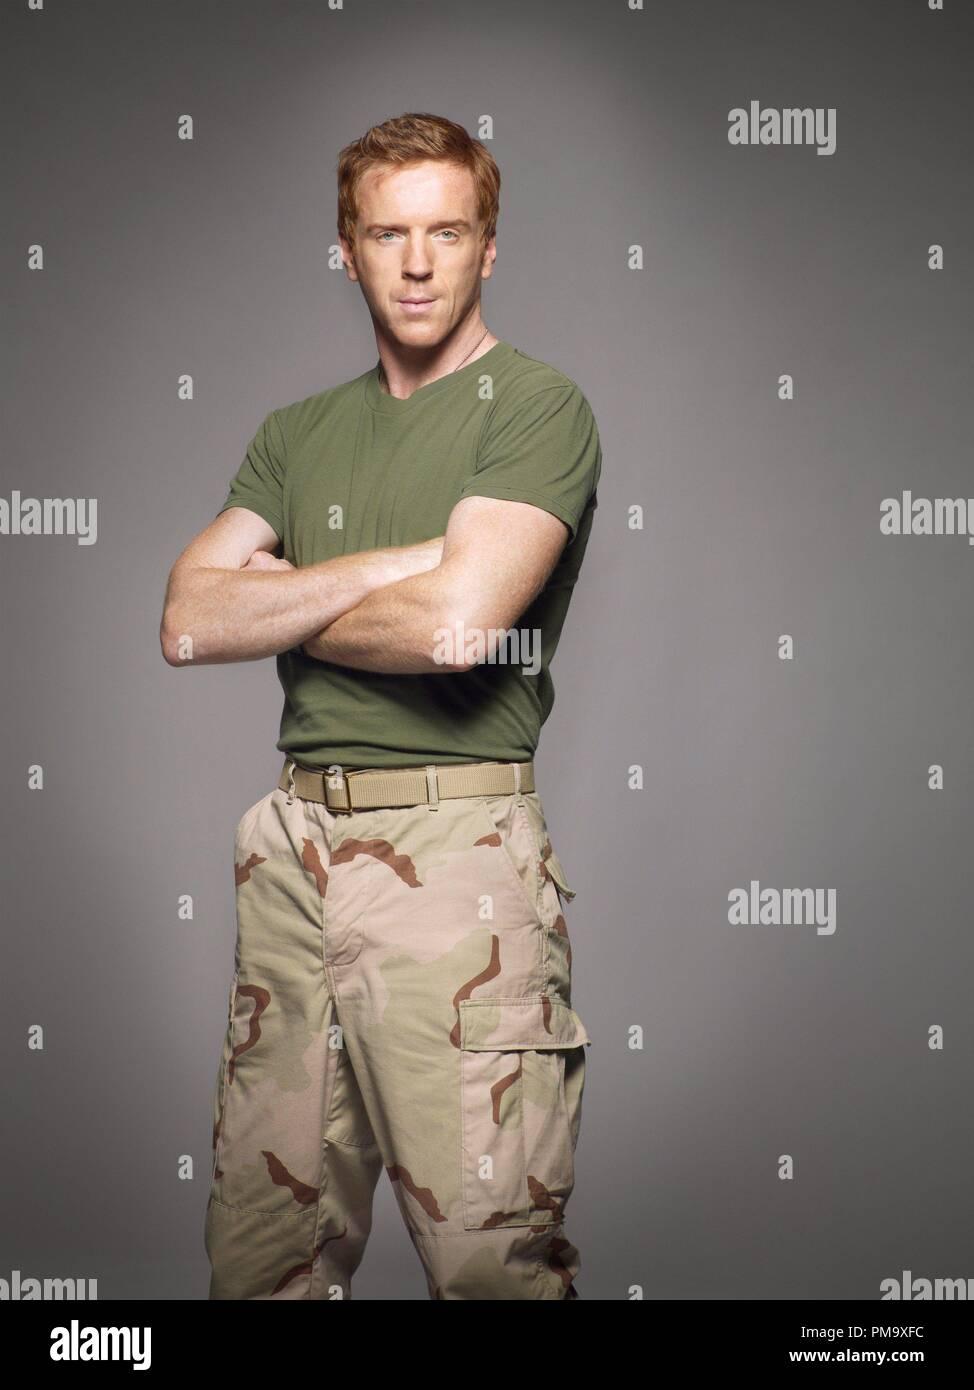 Damian Lewis 'Homeland' Season 1 (2011) - Stock Image